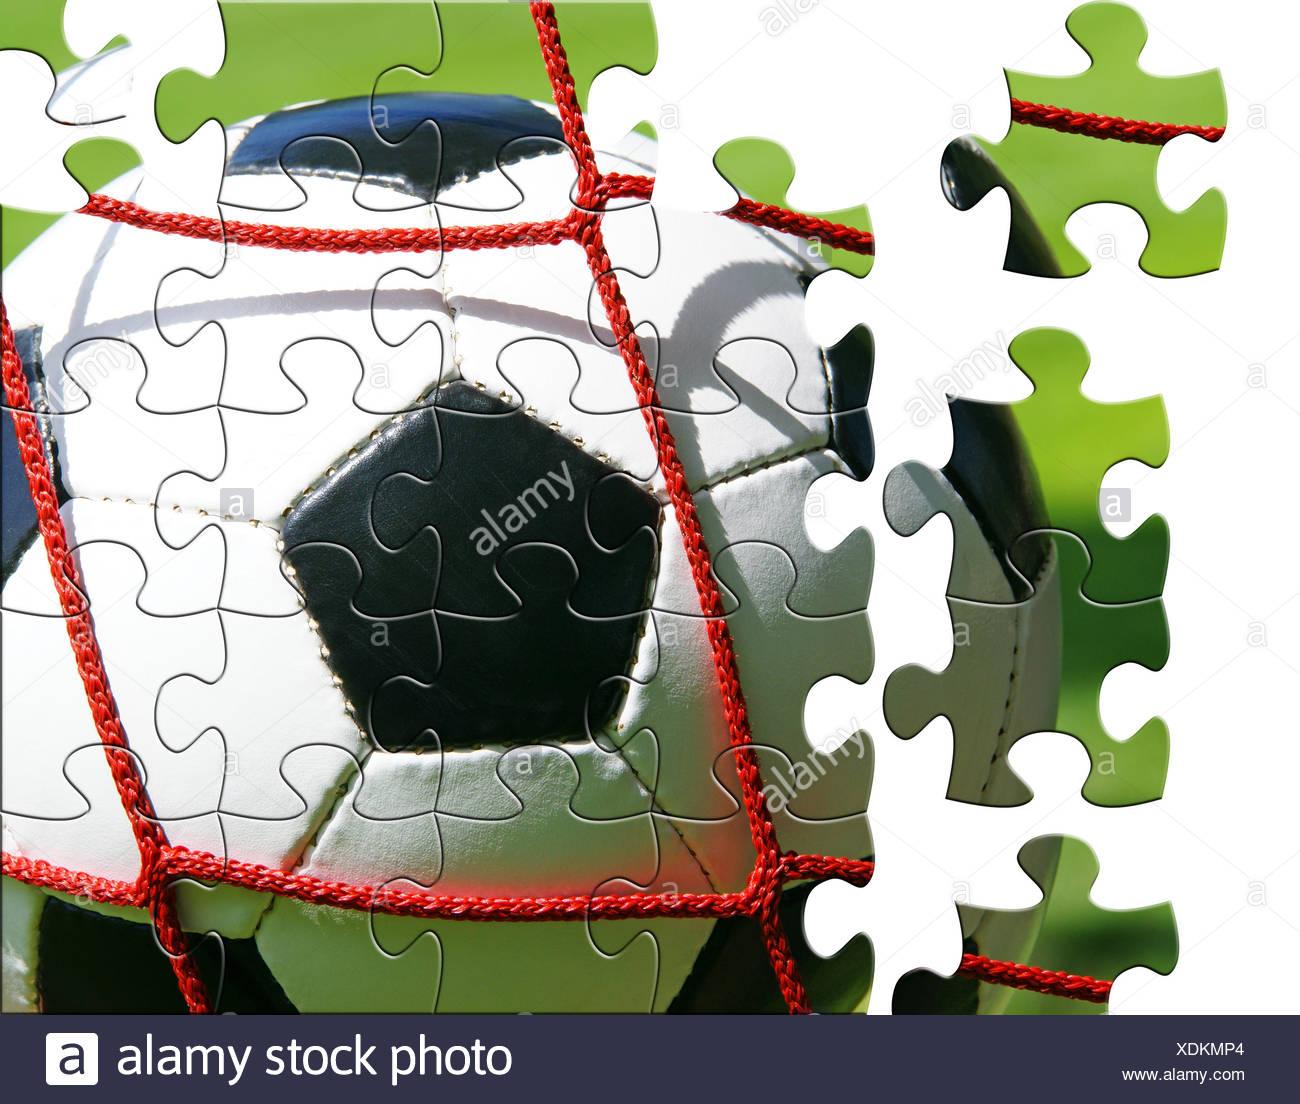 Fussball Puzzle Stockfoto Bild 283789804 Alamy